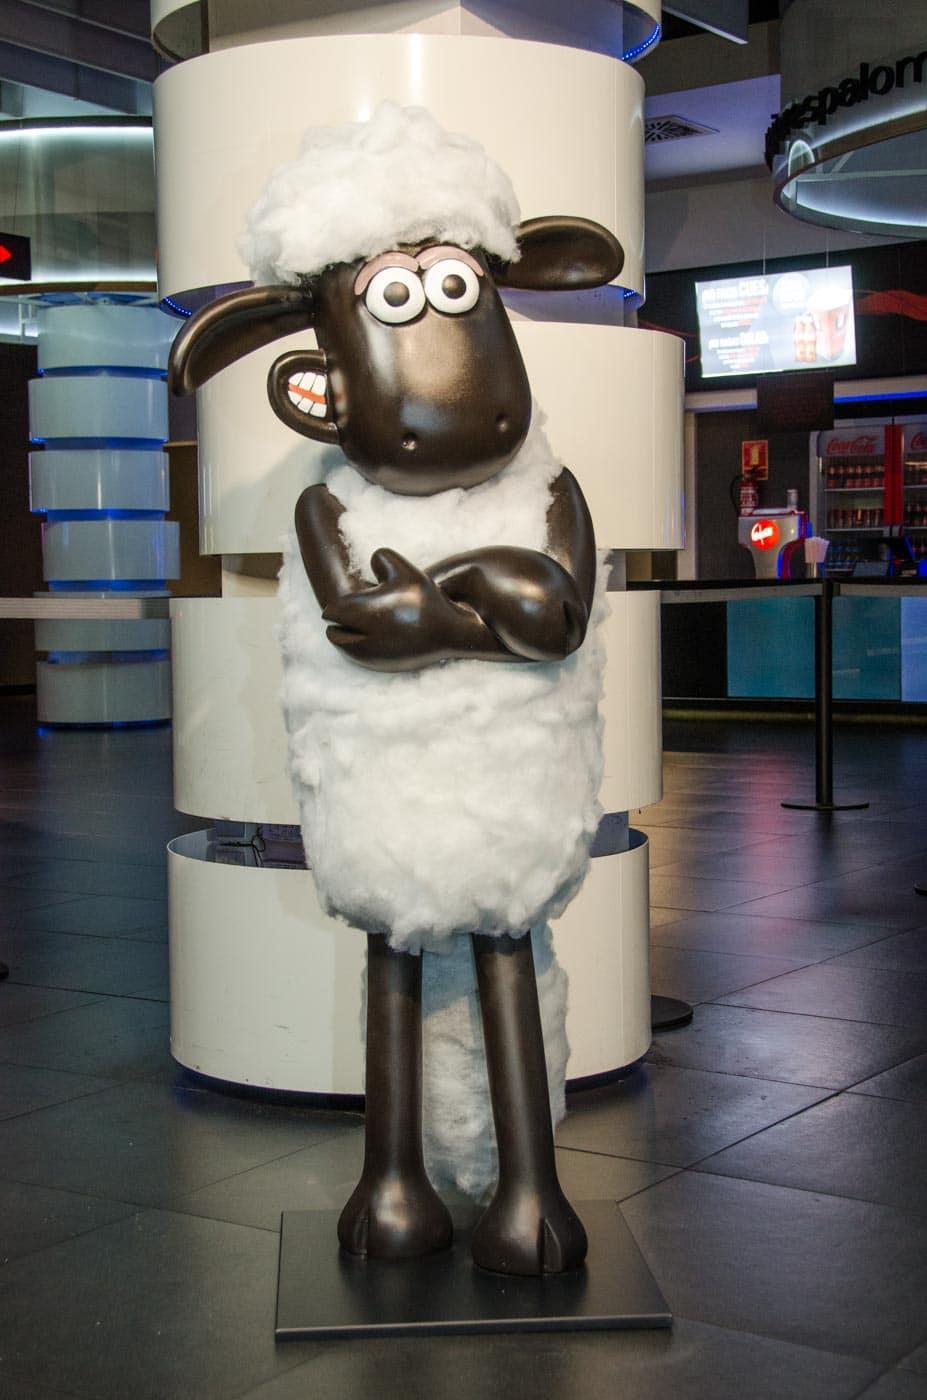 Escultura de porexpan de la oveja shaun de frente